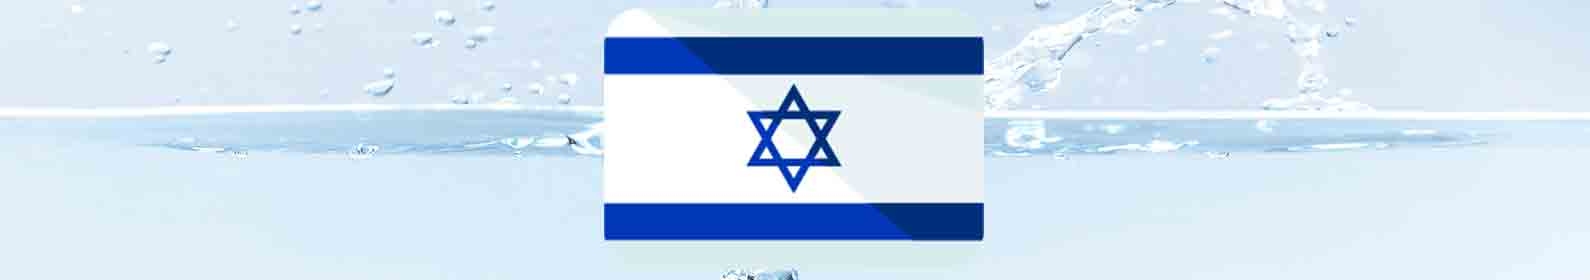 tratamento-de-agua-israel.jpg